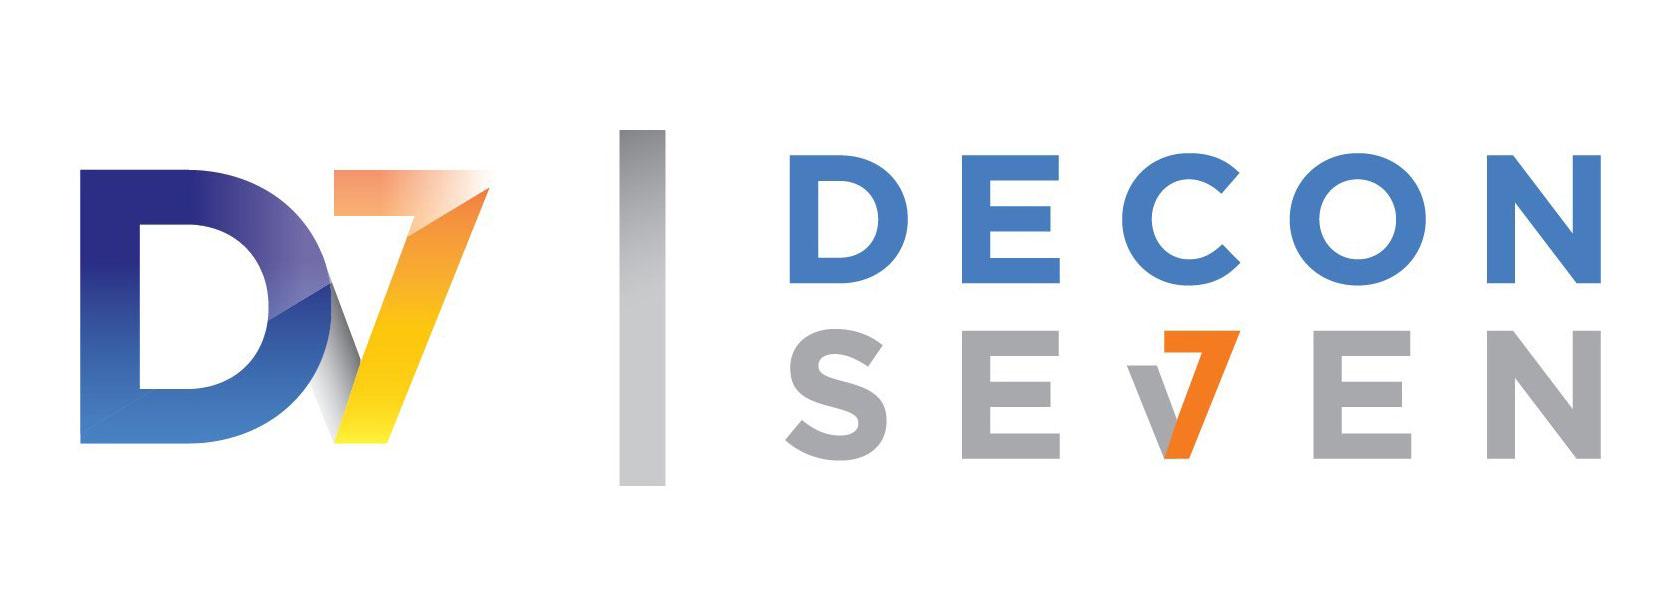 EPA Designates Decon7 as an Effective COVID-19 Virus Disinfectant Spray